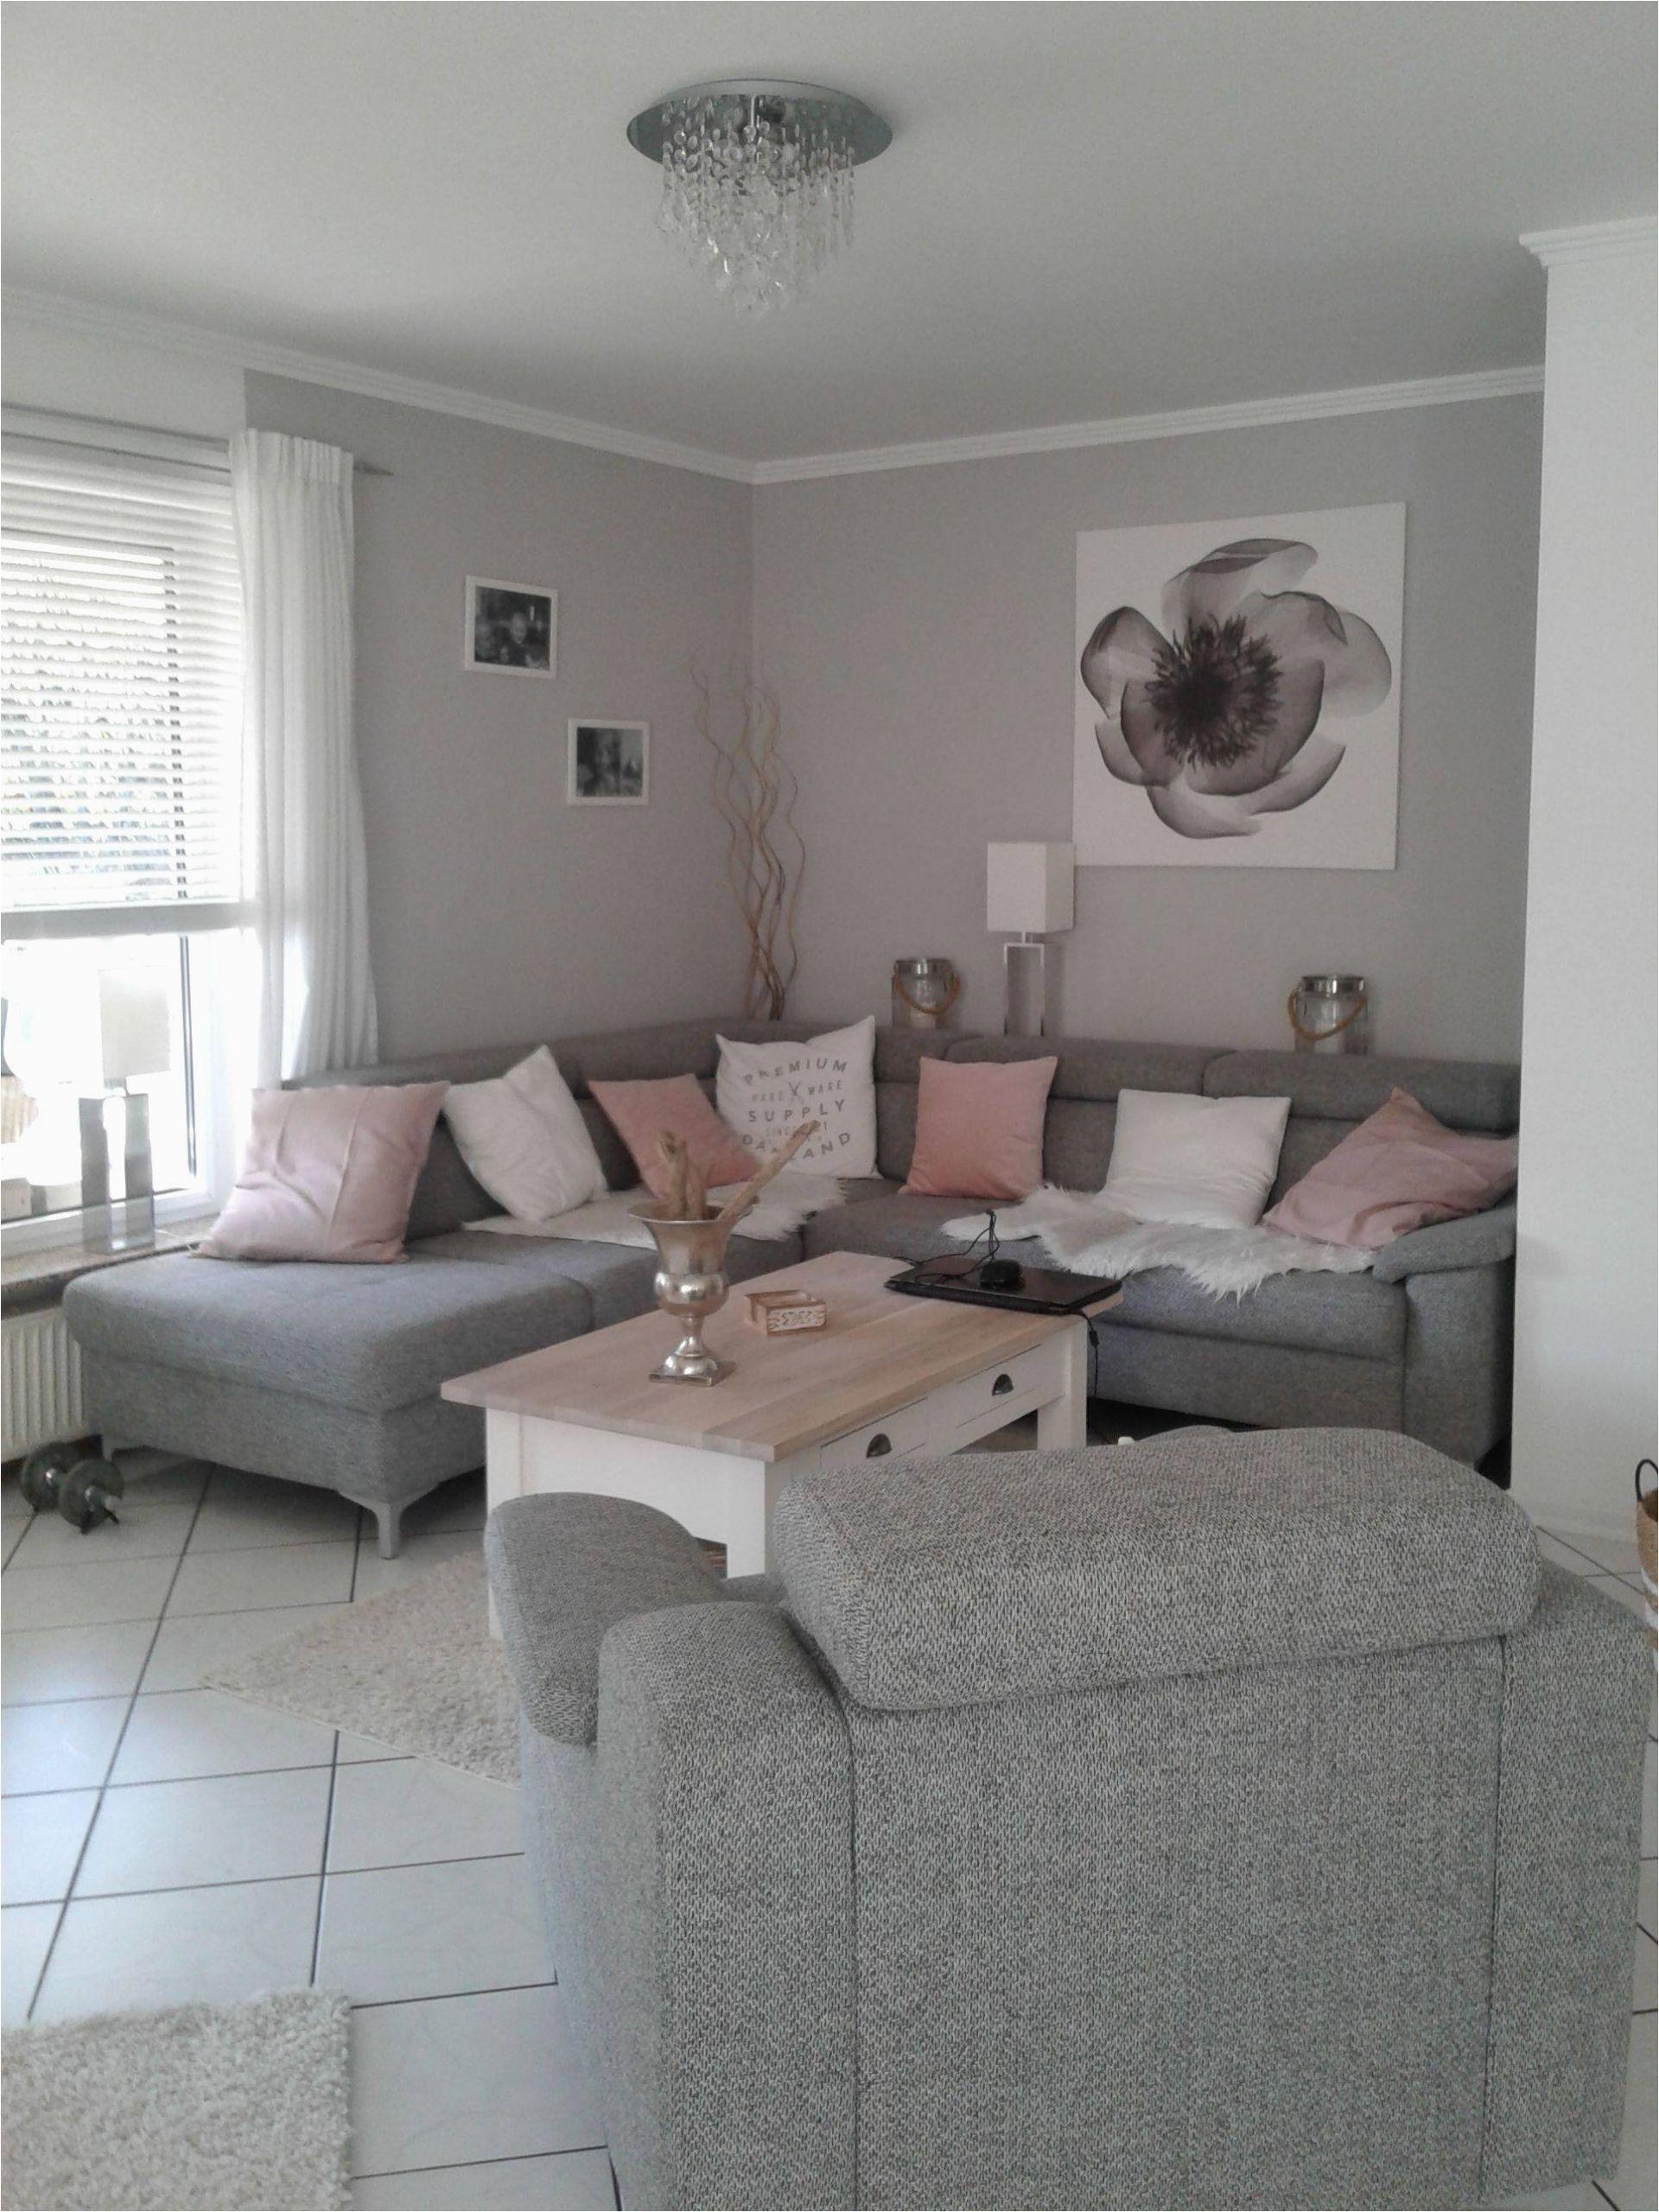 wand hinter bett mit wohnzimmer ideen pastell beautiful wand hinter dem bett 80 und wohnzimmer ideen pastell best of rosa deko wohnzimmer planen was solltest du tun of wohnzimmer ideen pastell mit wan